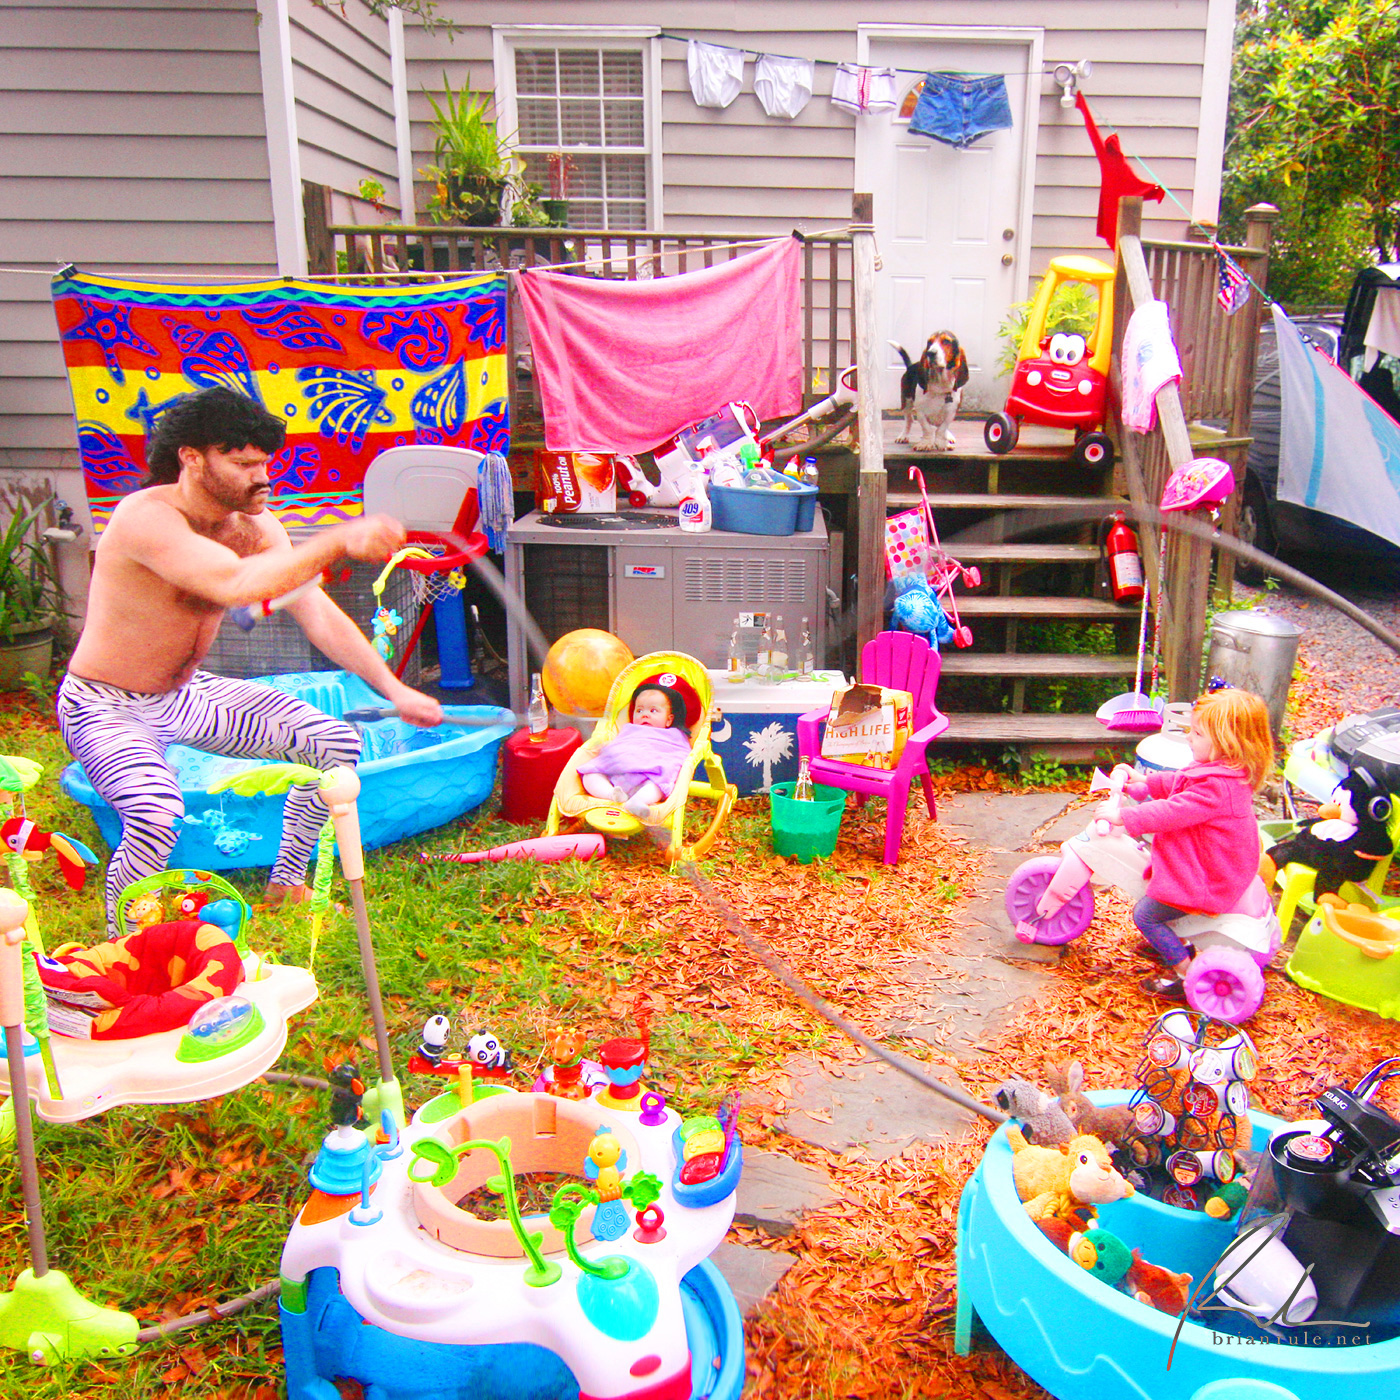 brian-rule-photo-gtl-04-babysitting